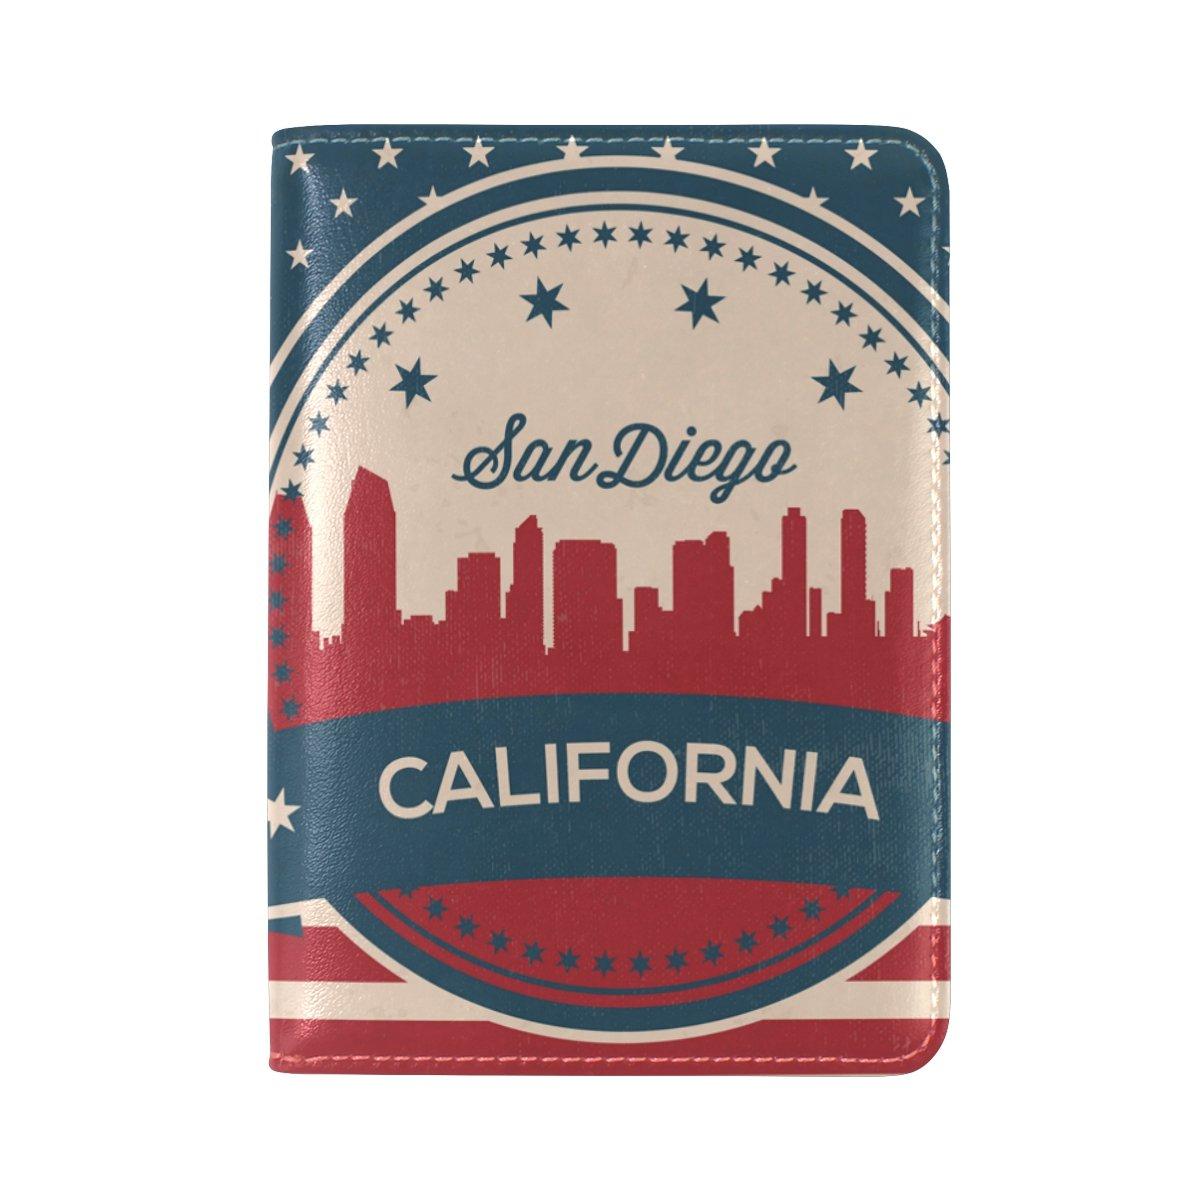 Vintage American Flag California State San Diego Skyline Leather Passport Cover - Holder - for Men & Women - Passport Case